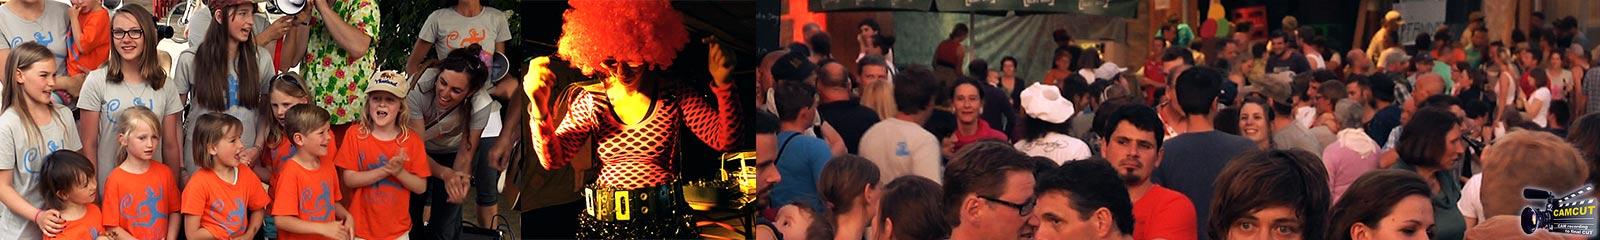 Header Sphinxtfest 2014